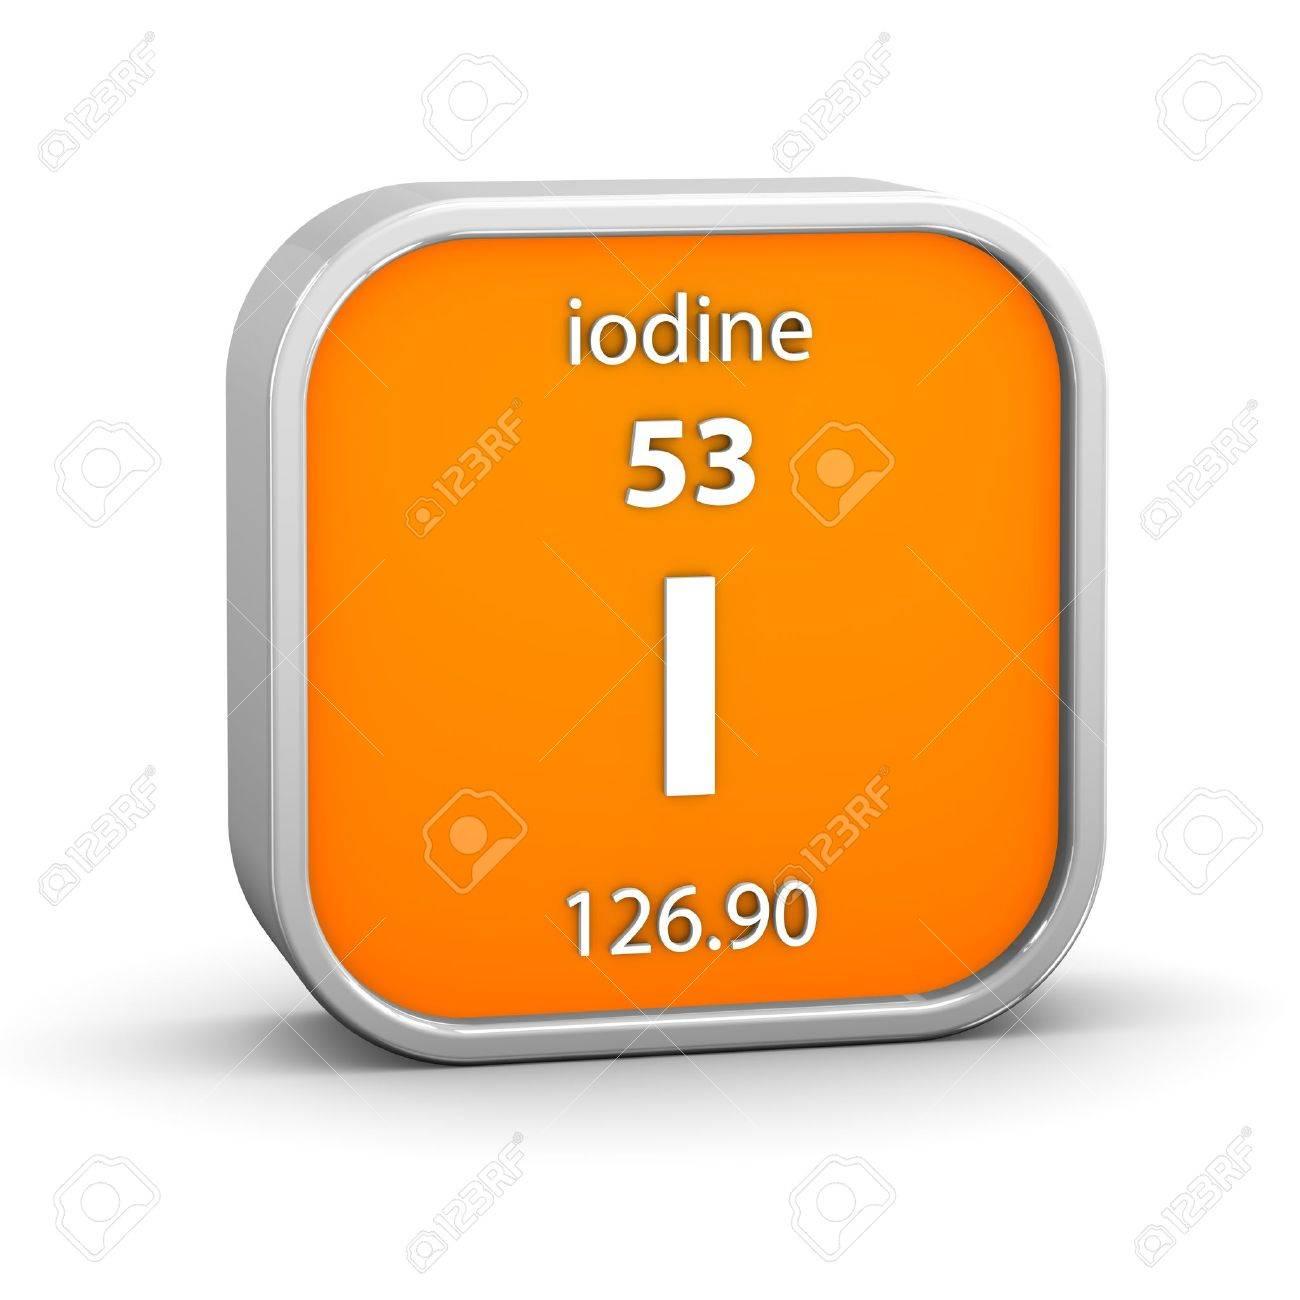 Periodic table symbol for iodine image collections periodic what is the symbol for iodine on the periodic table choice image what is the symbol gamestrikefo Gallery